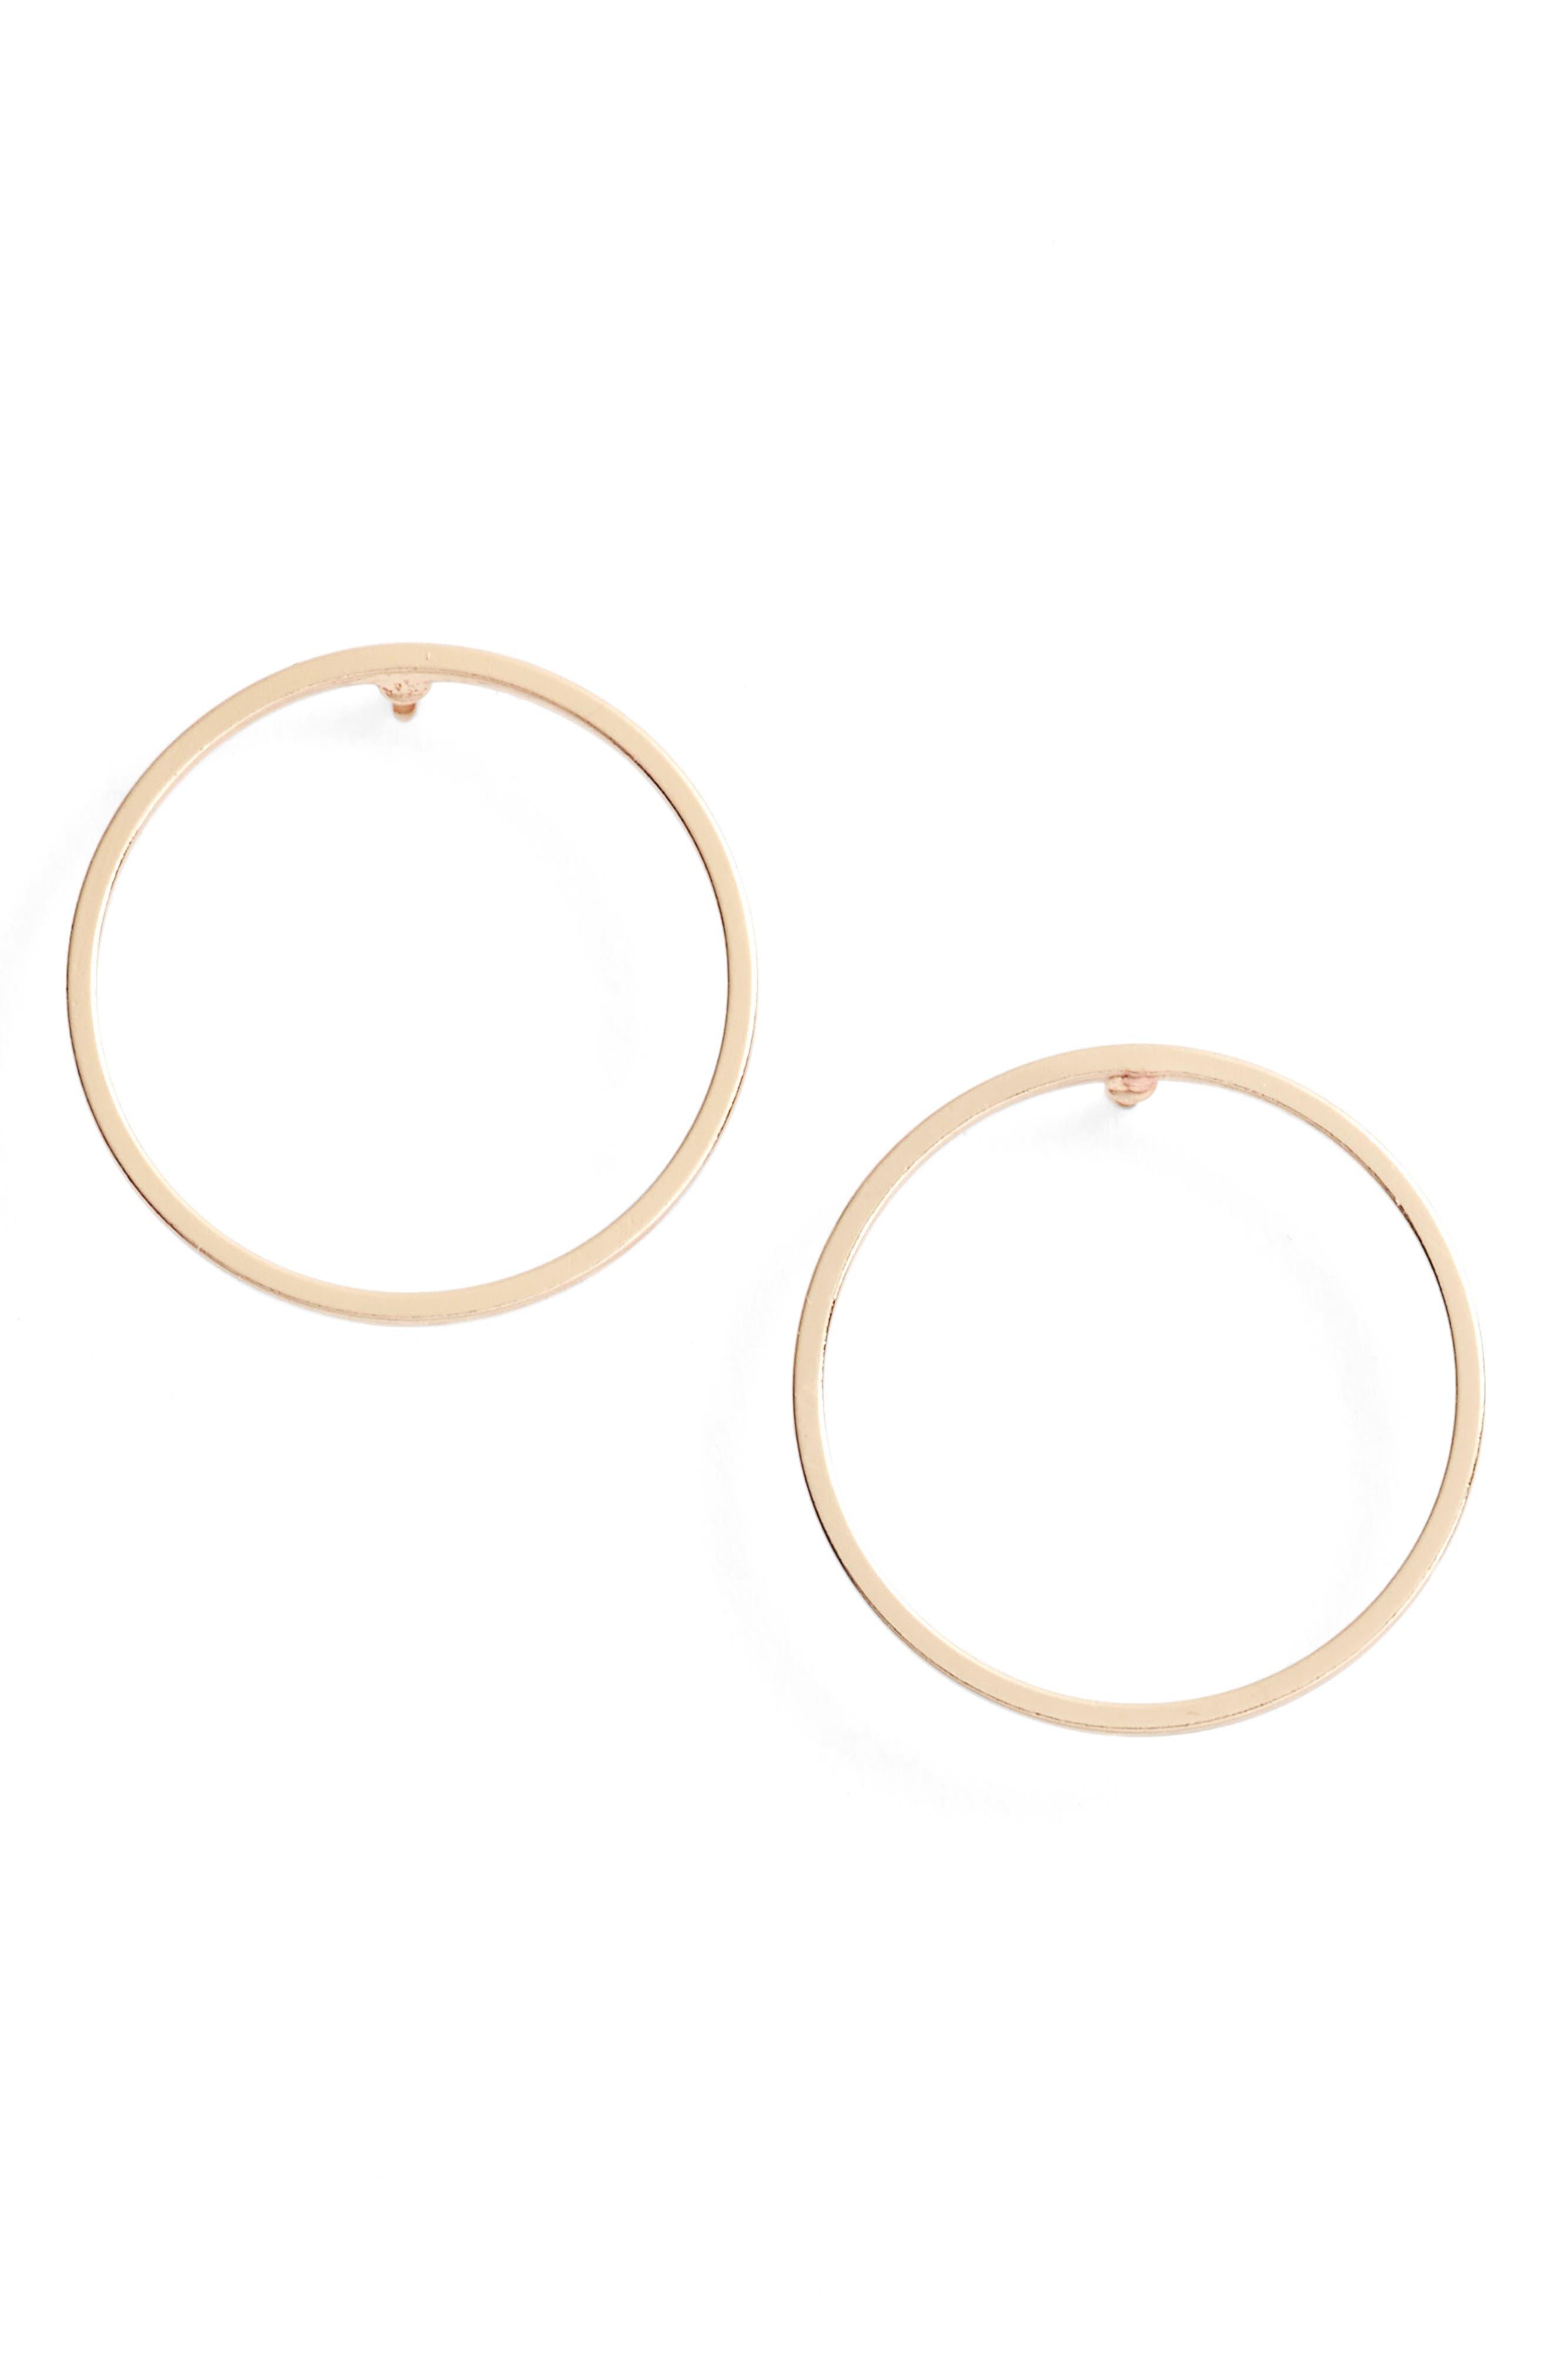 Juliette Circle Earrings,                         Main,                         color, Gold